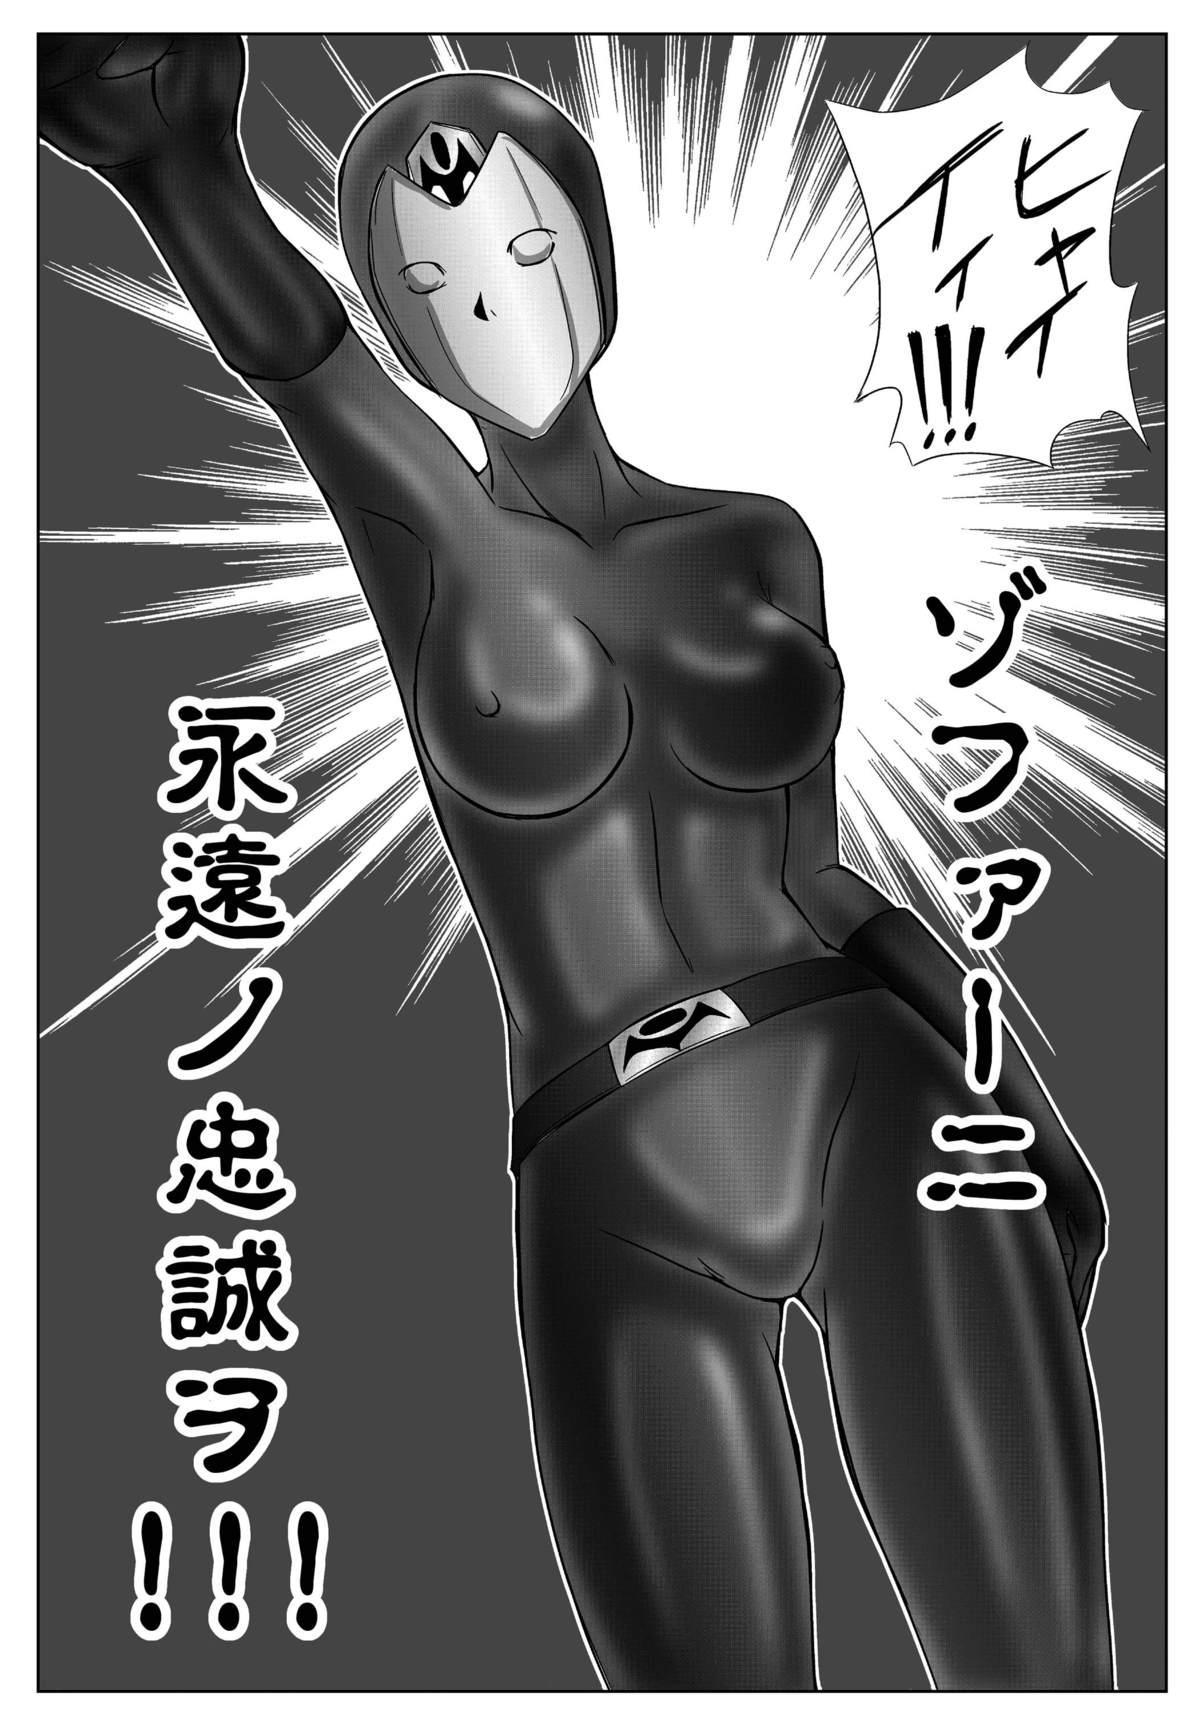 [Macxe's (monmon)] Tokubousentai Dinaranger ~Heroine Kairaku Sennou Keikaku~ Vol.01/02/03 (Renkaban) [Digital] 110